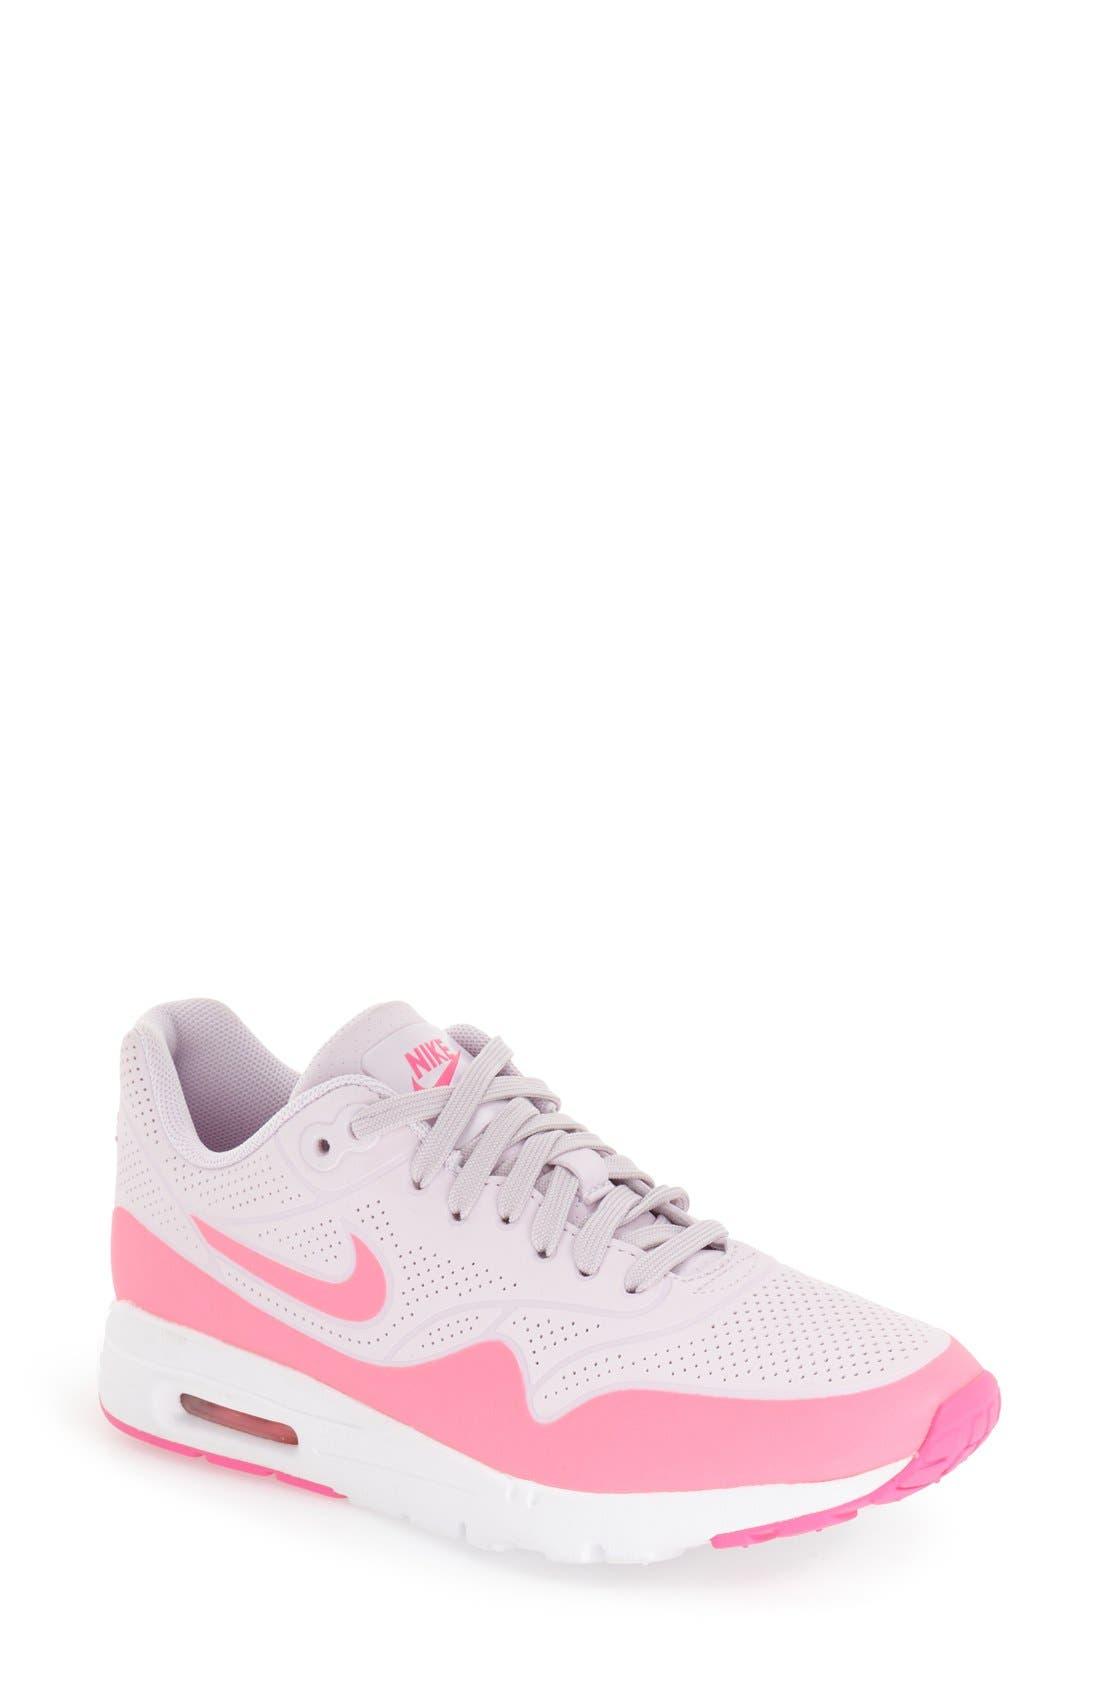 Alternate Image 1 Selected - Nike 'Air Max 1 - Ultra Moire' Sneaker (Women)